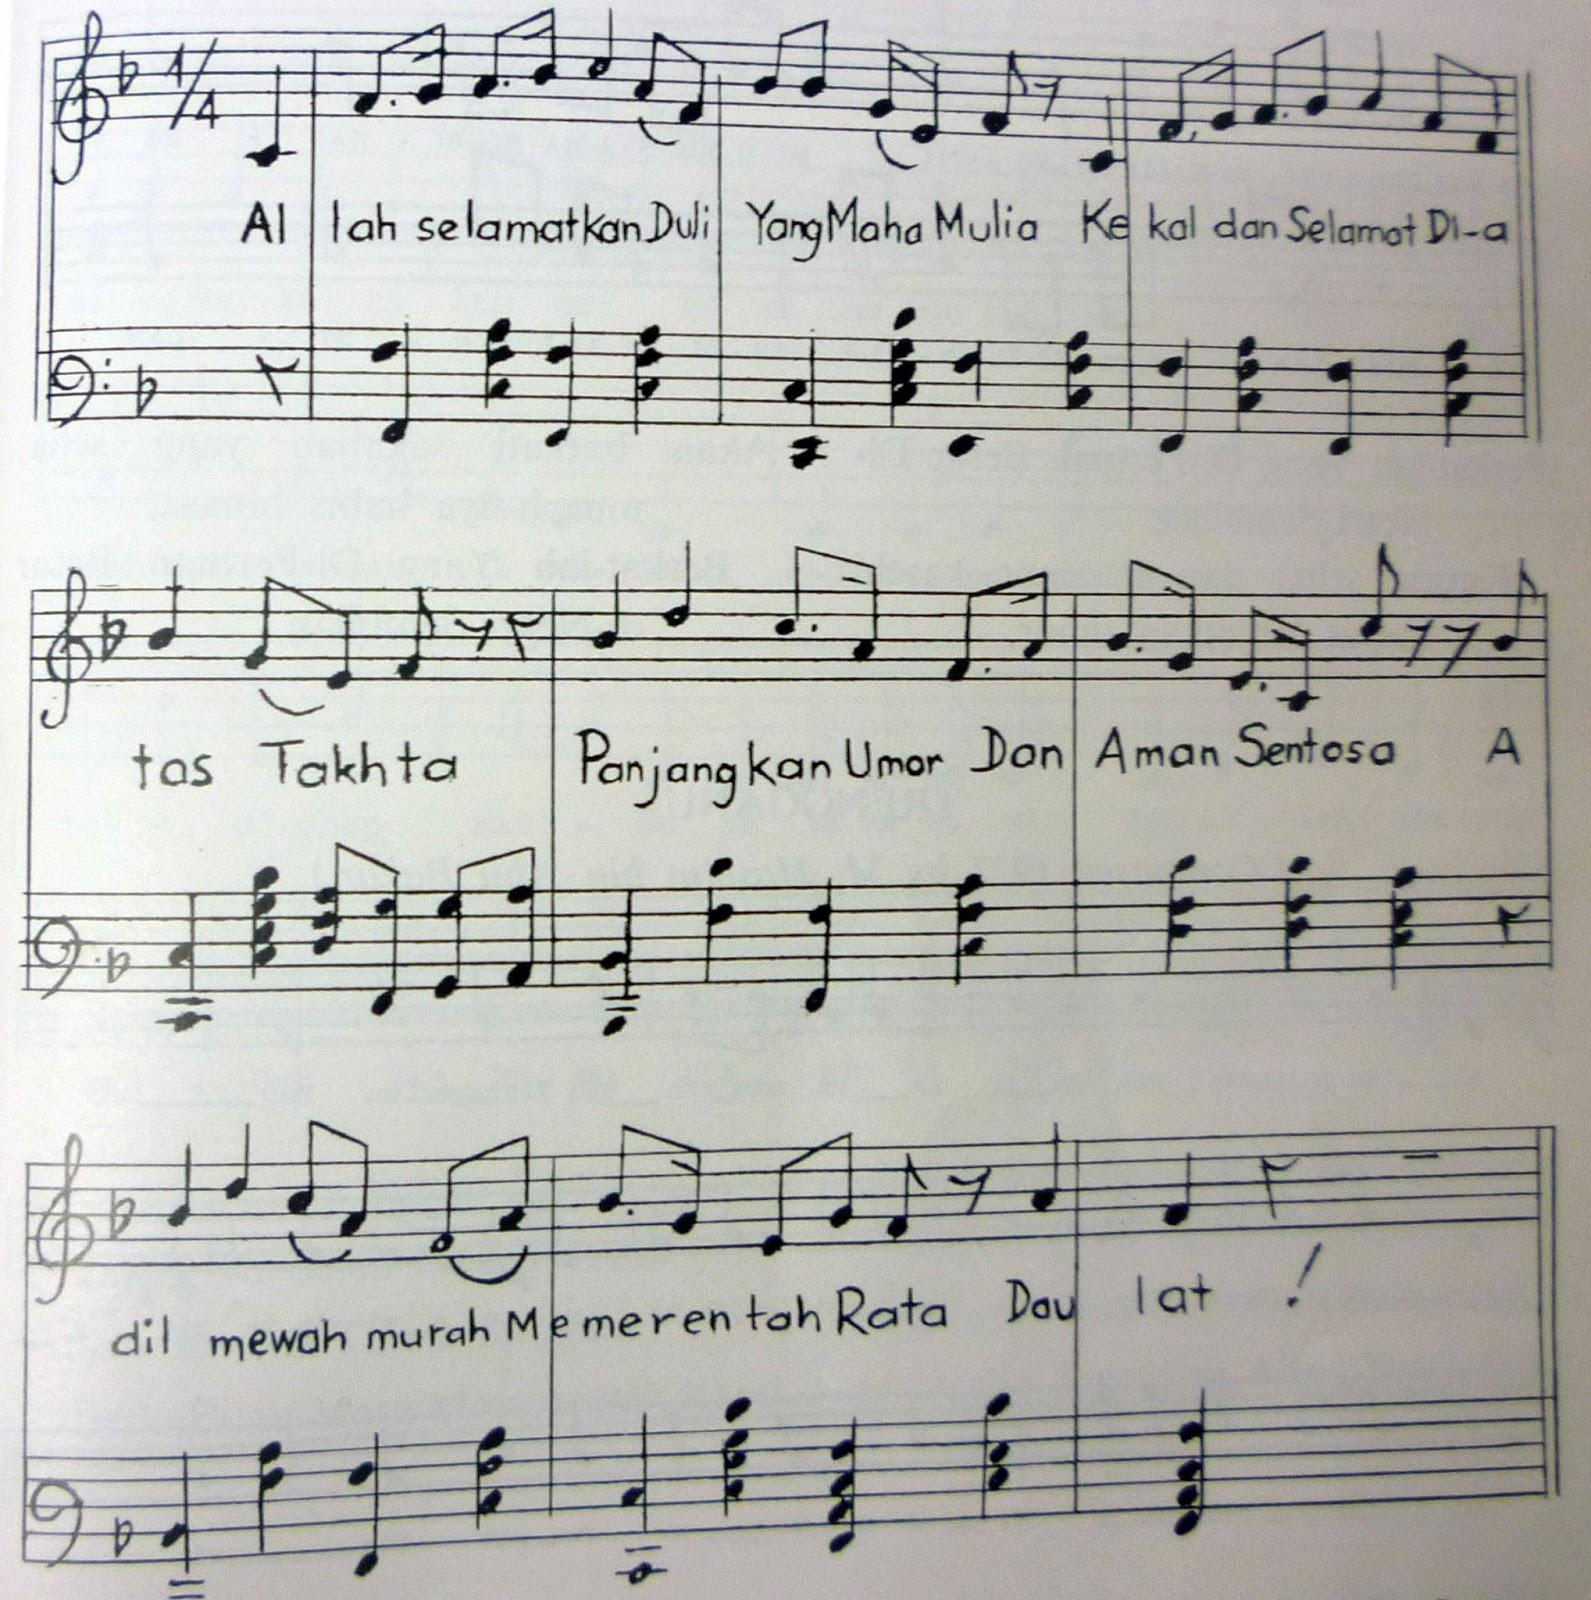 Chord Gitar Lagu Malaysia Merayu: Lirik Lagu Lirik Lagu Malaysia